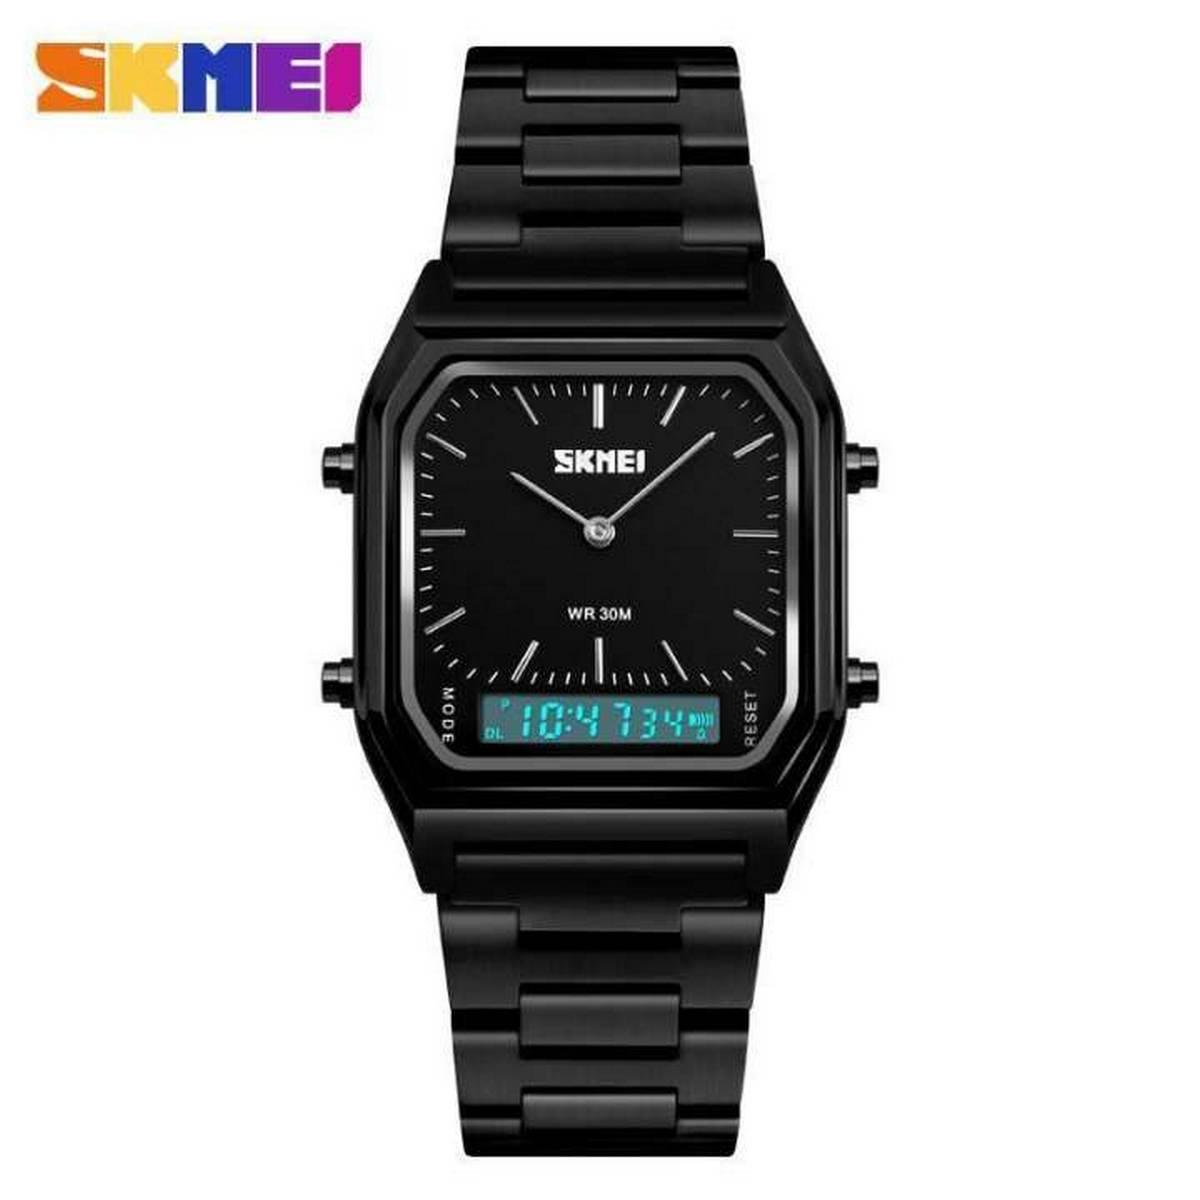 SKMEI 1220 Alloy Case 30M Waterproof Luminous Classic Quartz Digital Dual Display Watch For Men - Black